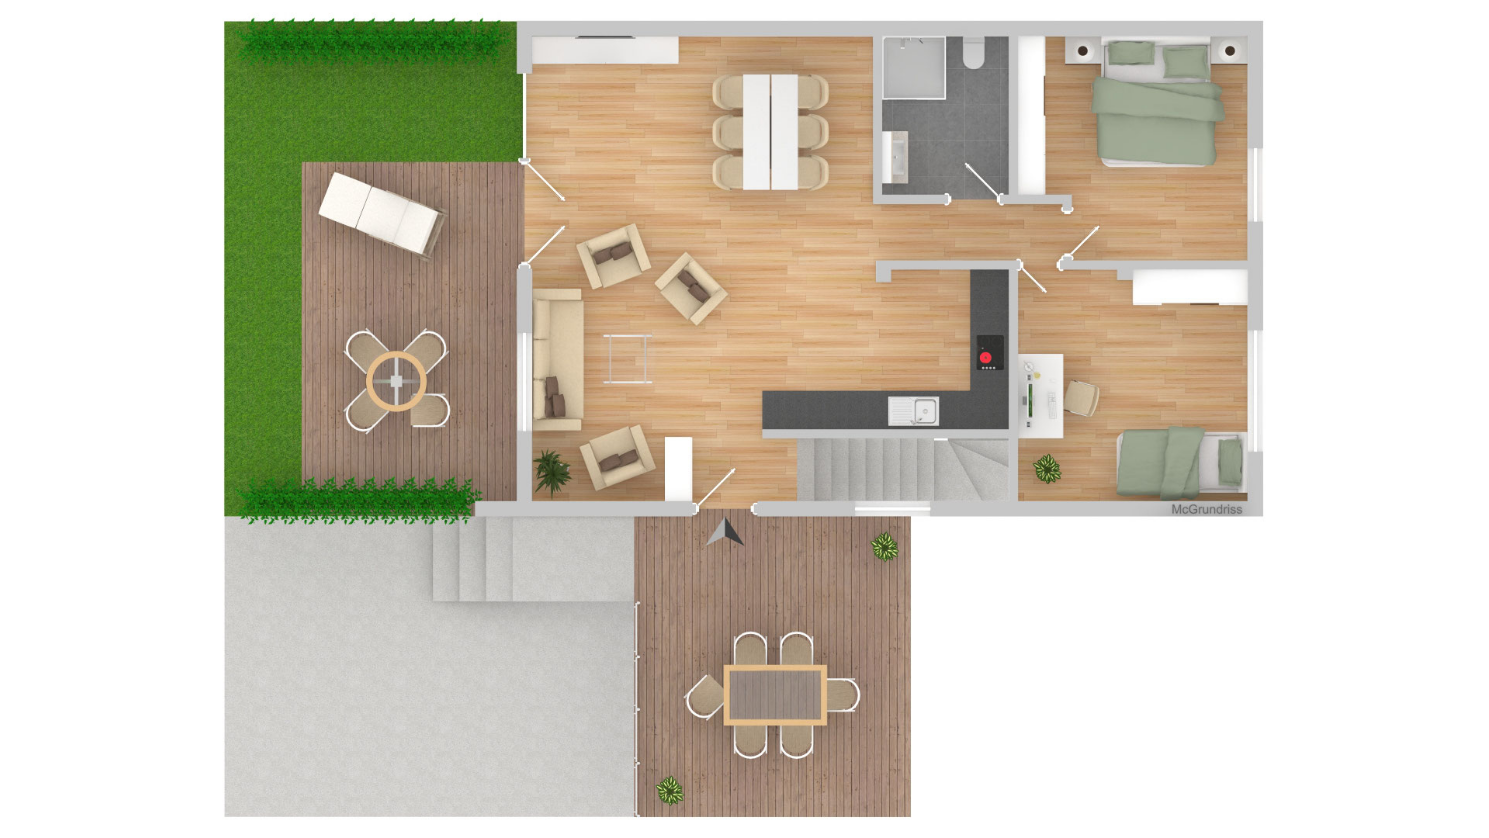 Heinemann Immobilien & Bauprojekte, Haan, Dürerstraße, Wohnung 3, Erdgeschoss